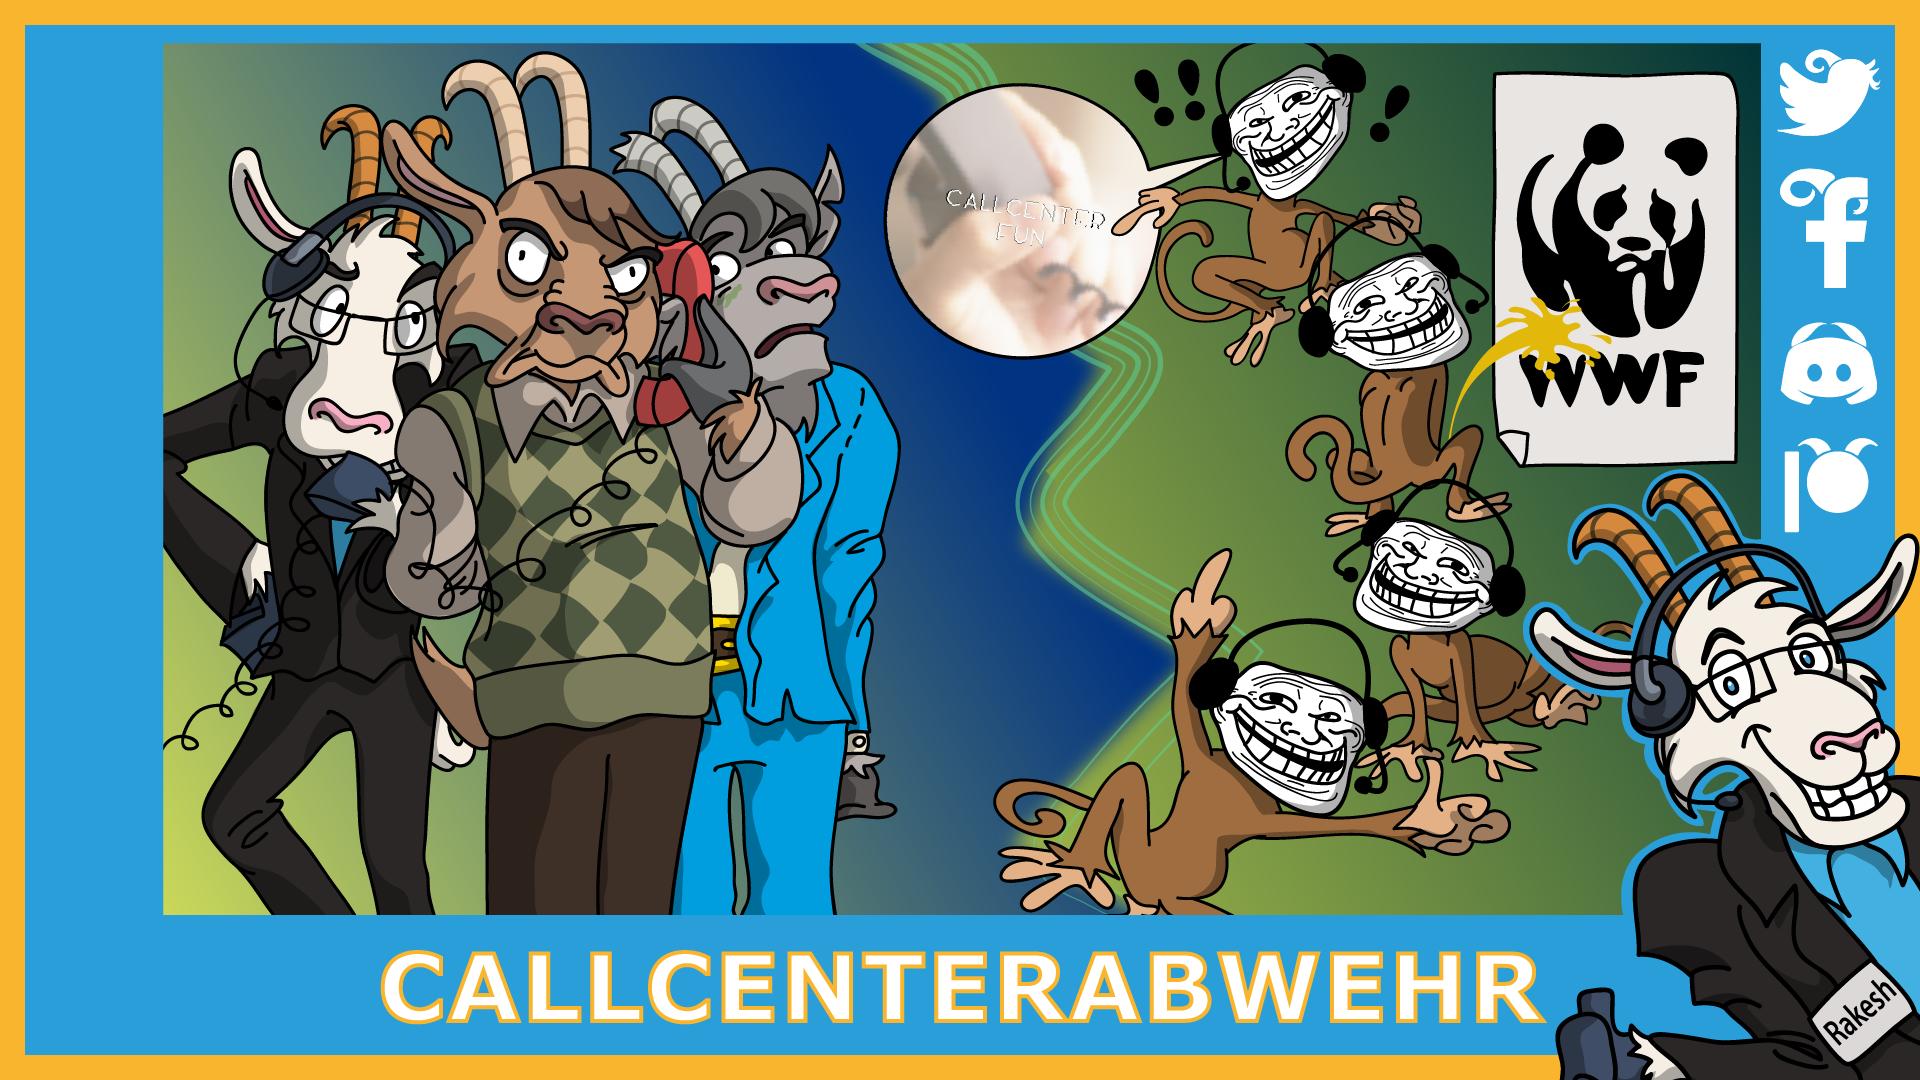 Telefonziege 'WWF-Betrueger (Callcenter Fun)' by Tabascofanatikerin